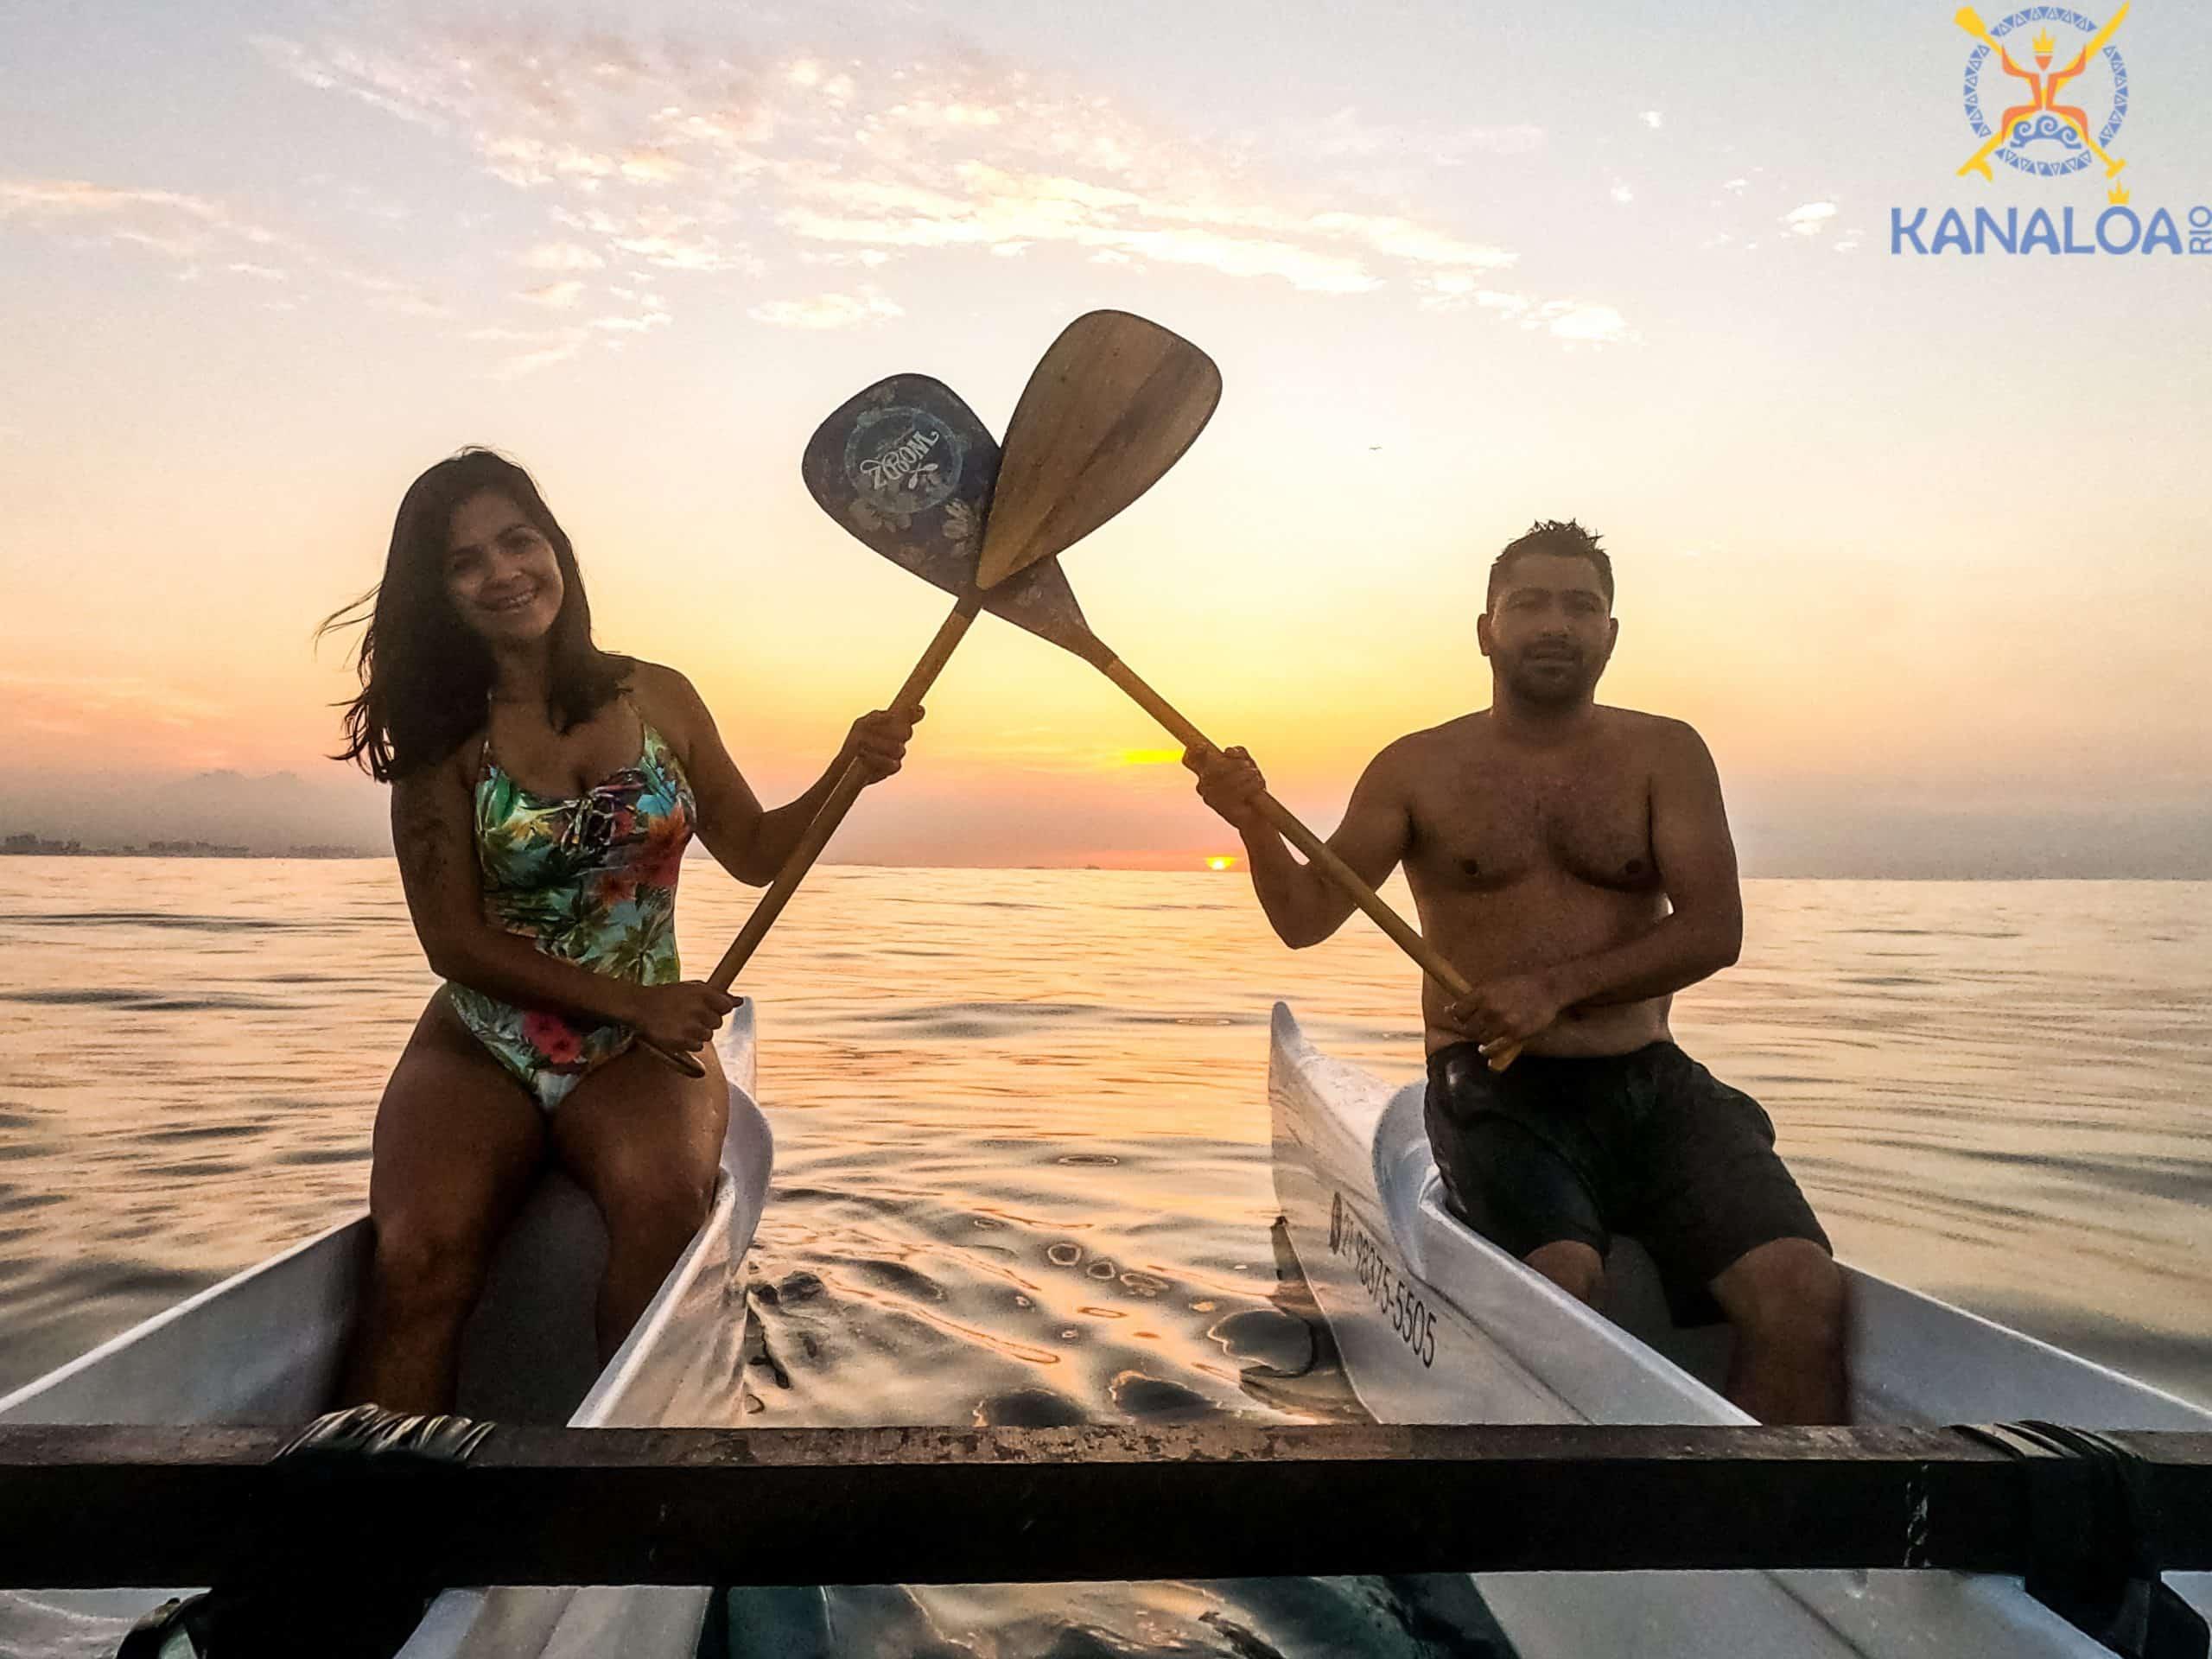 aula de canoa havaiana recreio